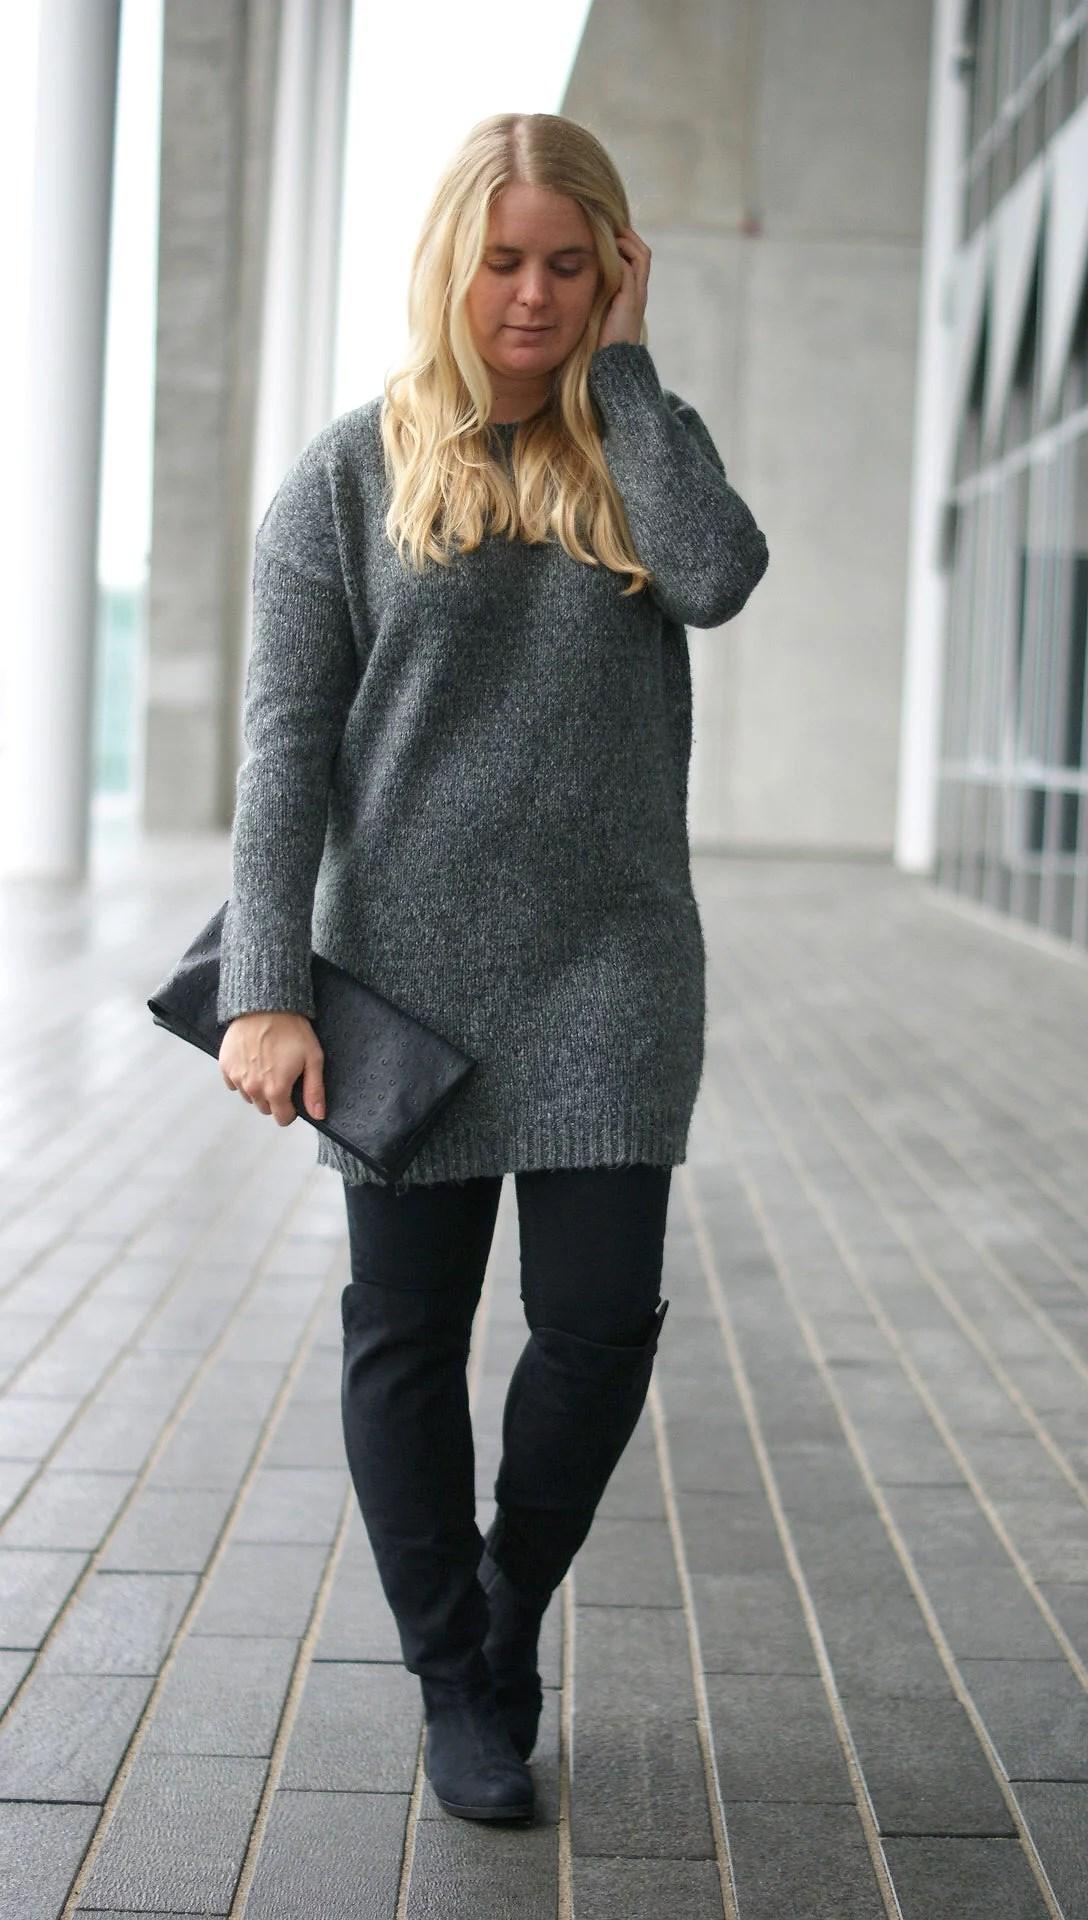 Knitdress-strik kjole-modeblogger